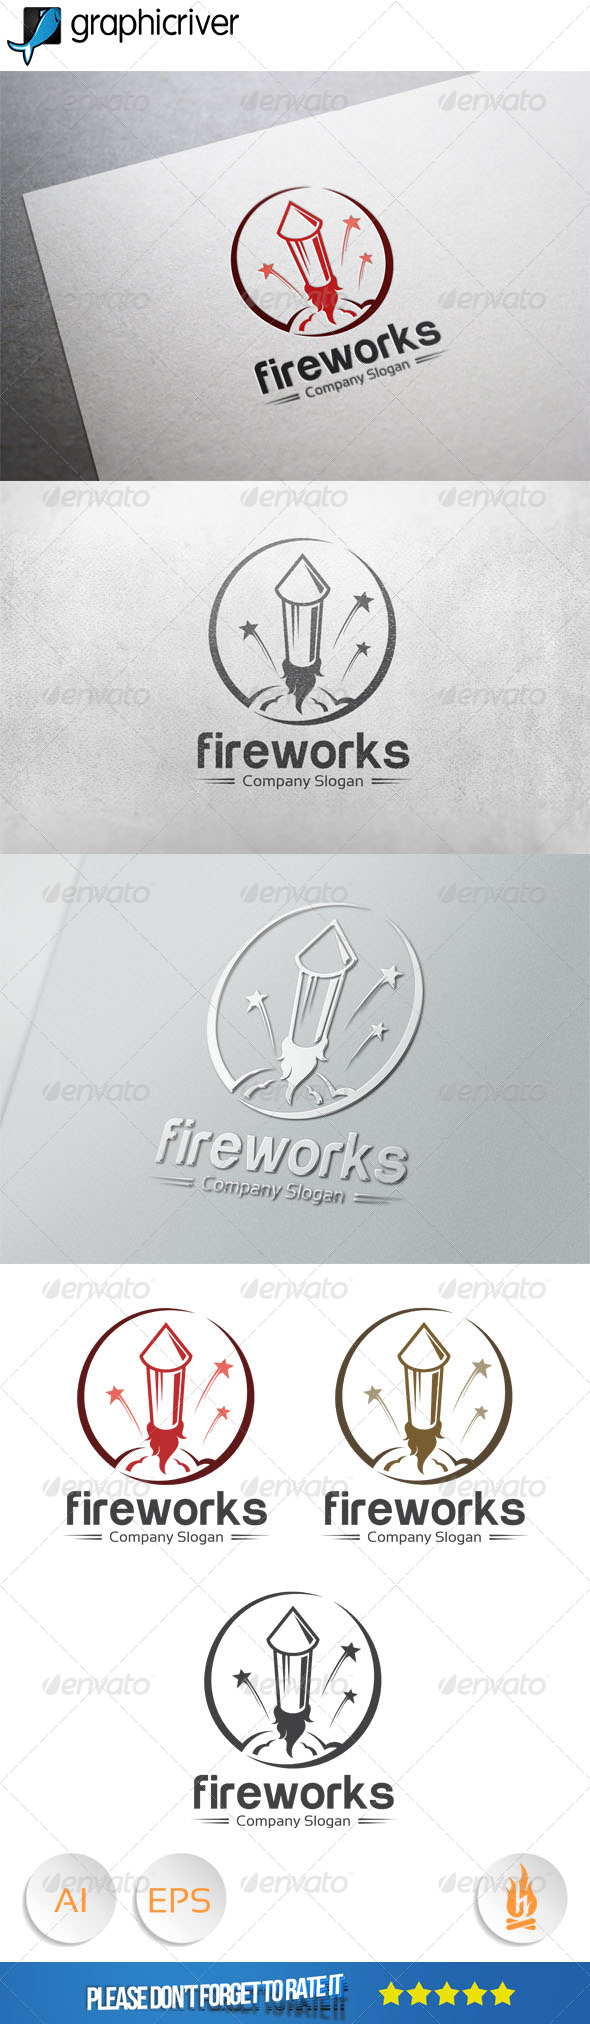 GraphicRiver Fireworks Logo 7980198